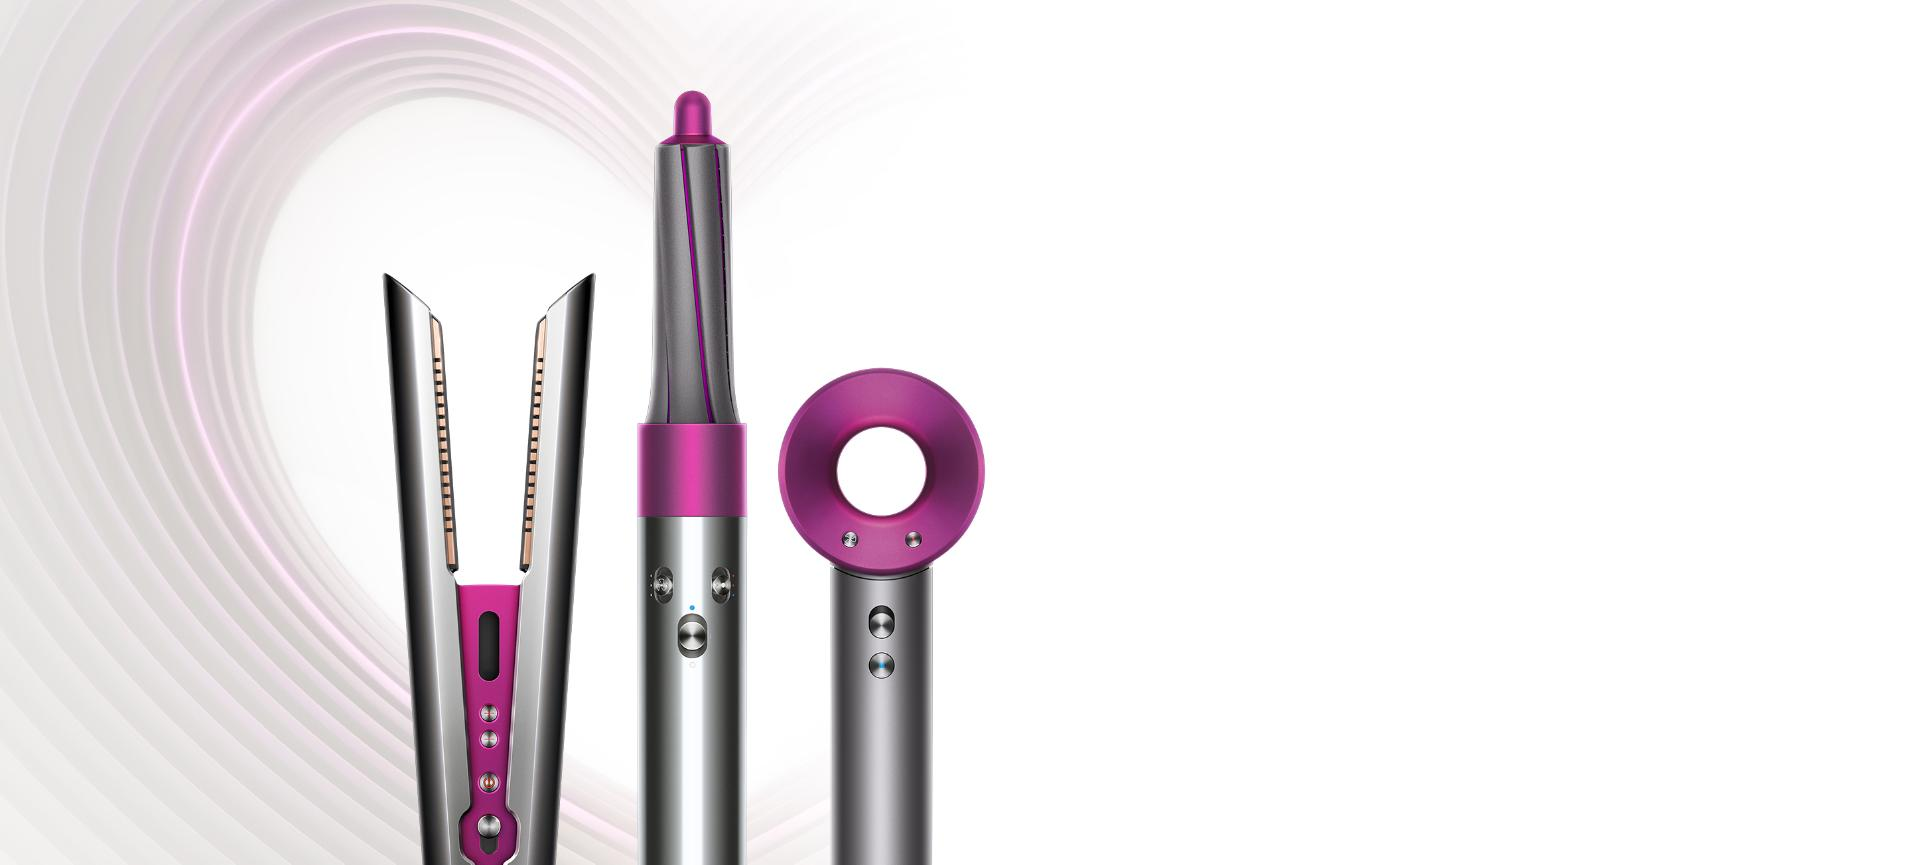 Dyson Supersonic hair dryer, Airwrap styler, Corrale straightener